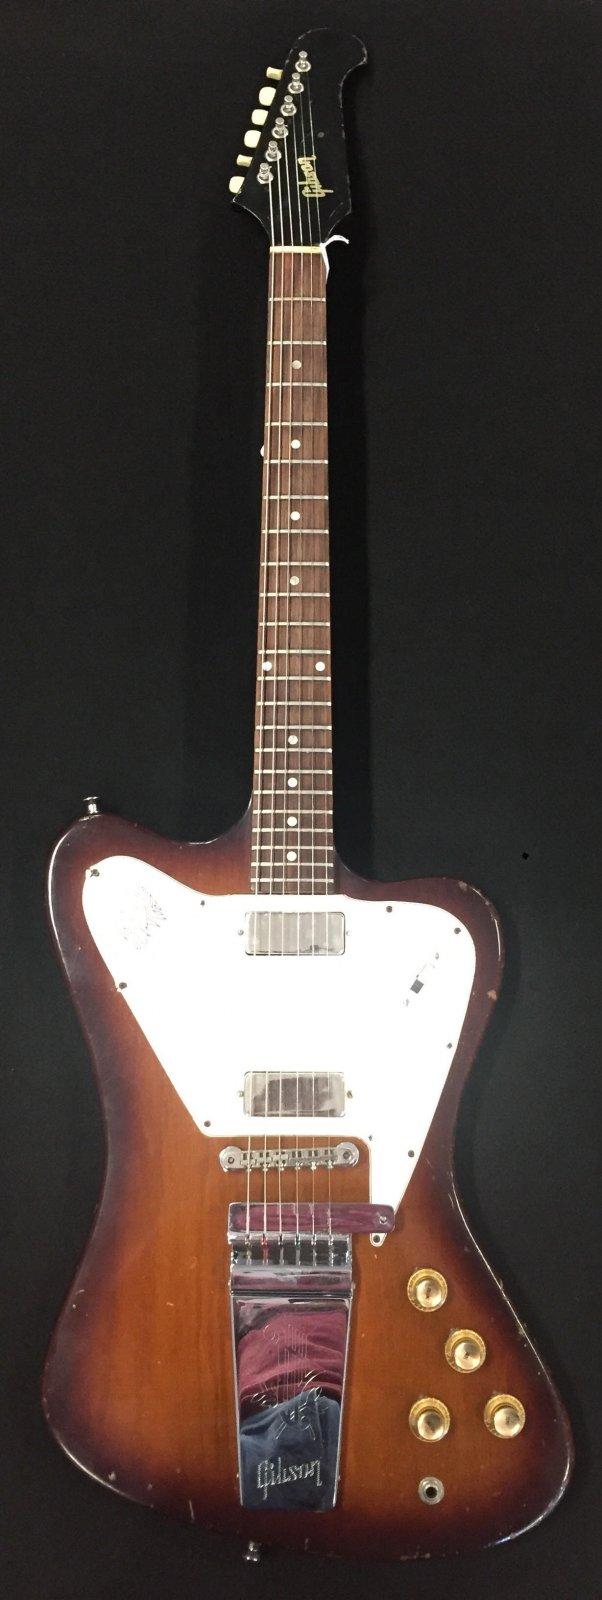 Gibson Firebird III reverse  vintage 1965